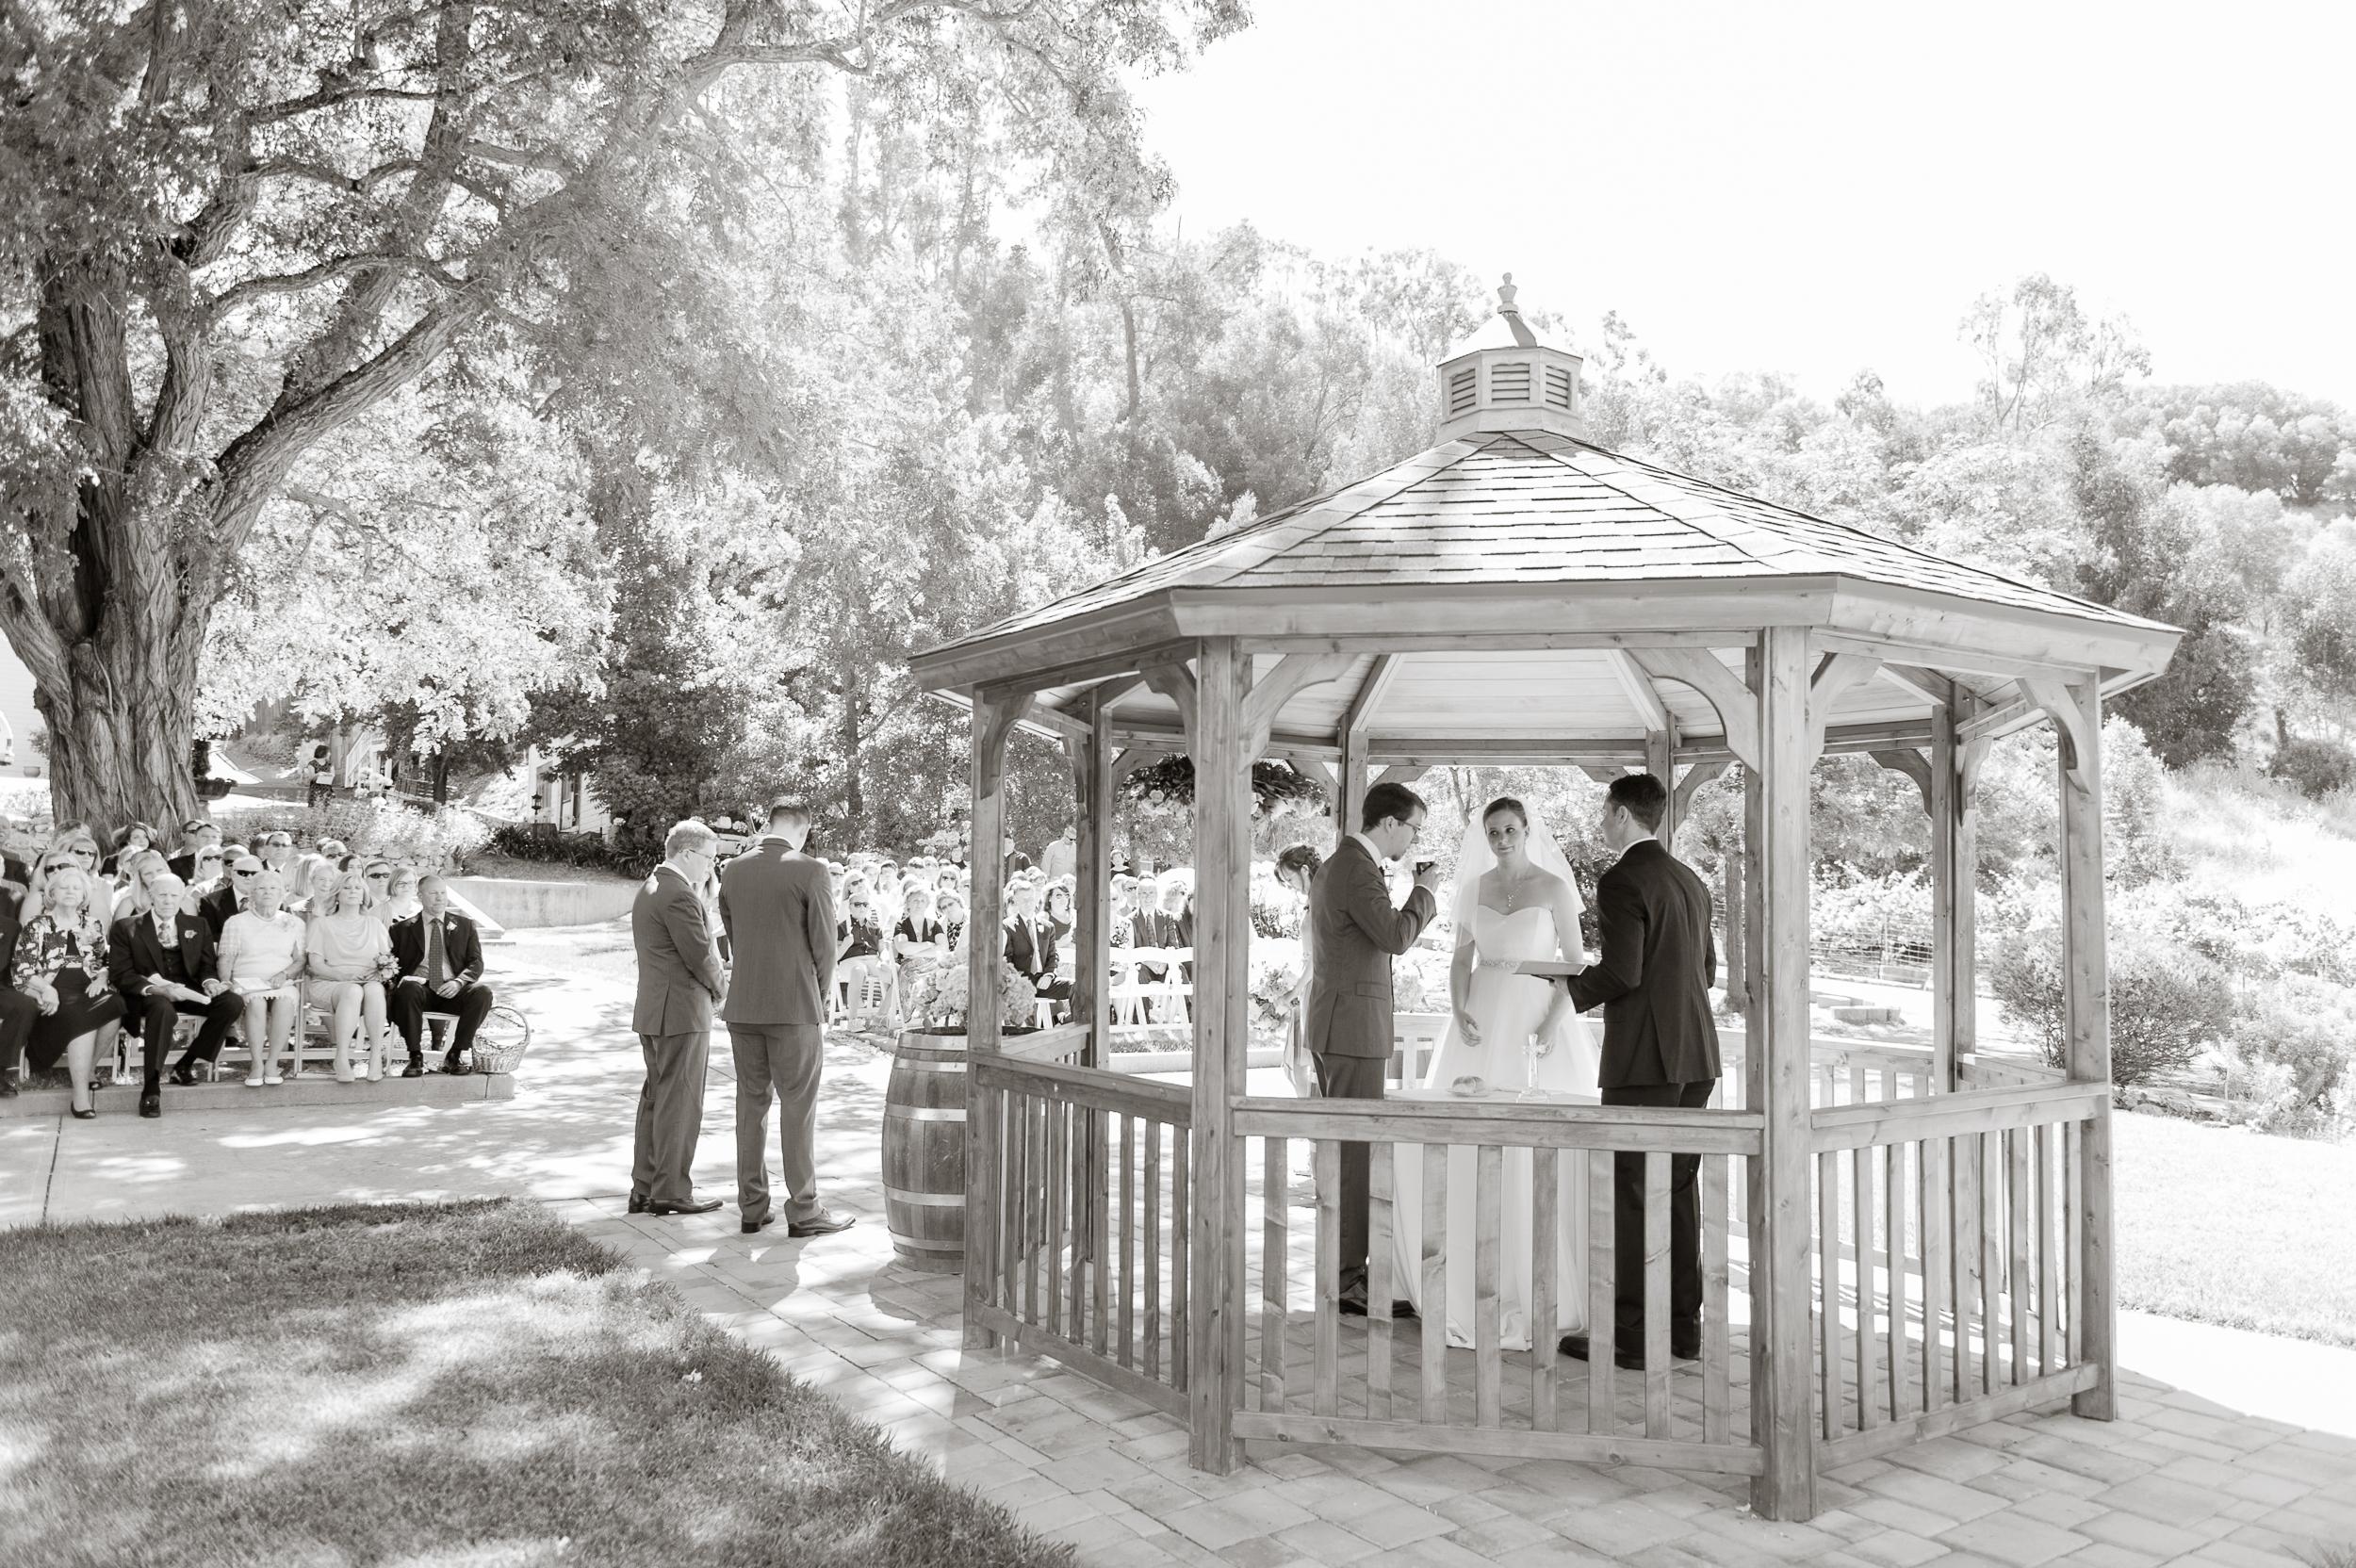 elliston-vineyards-morning-wedding-vivianchen-021.jpg